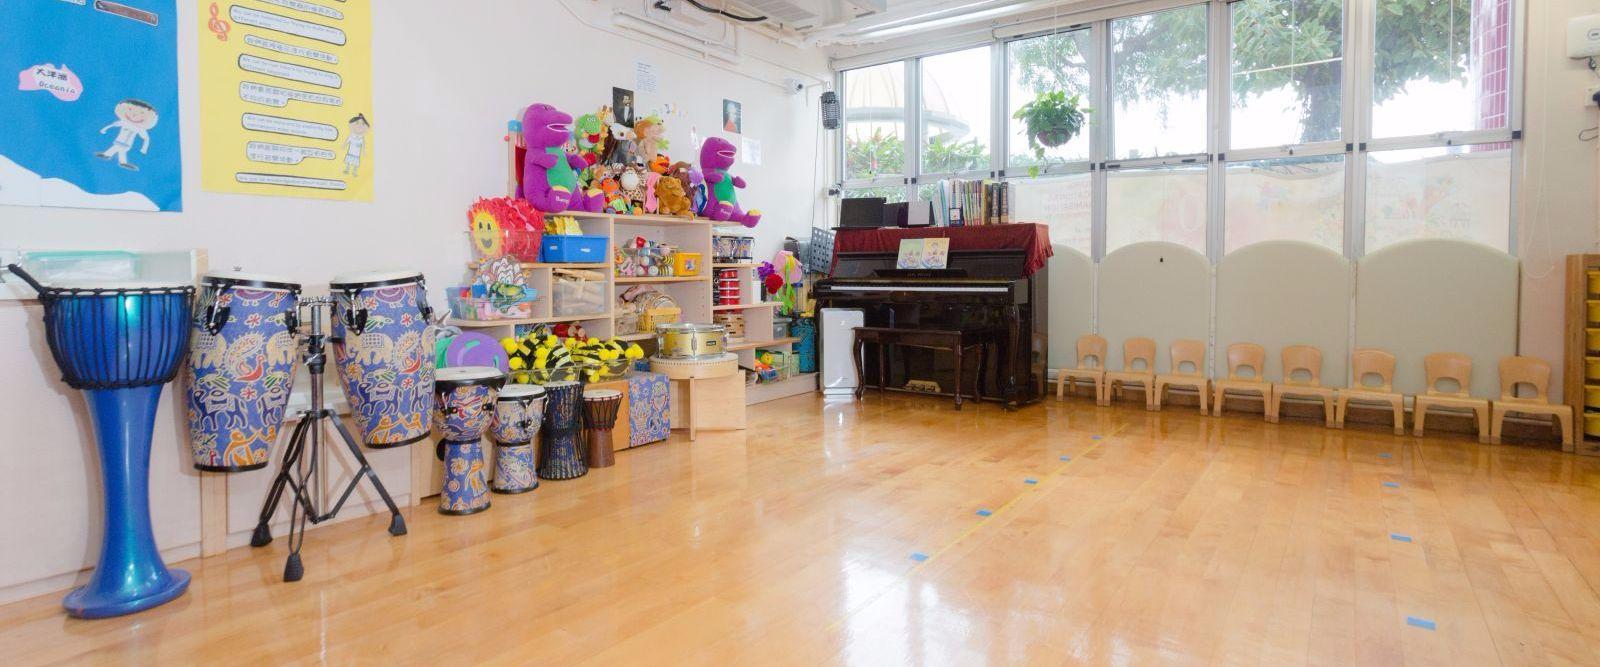 South Horizons | Victoria Kindergarten, Nursery ,Infant & Toddler Programme